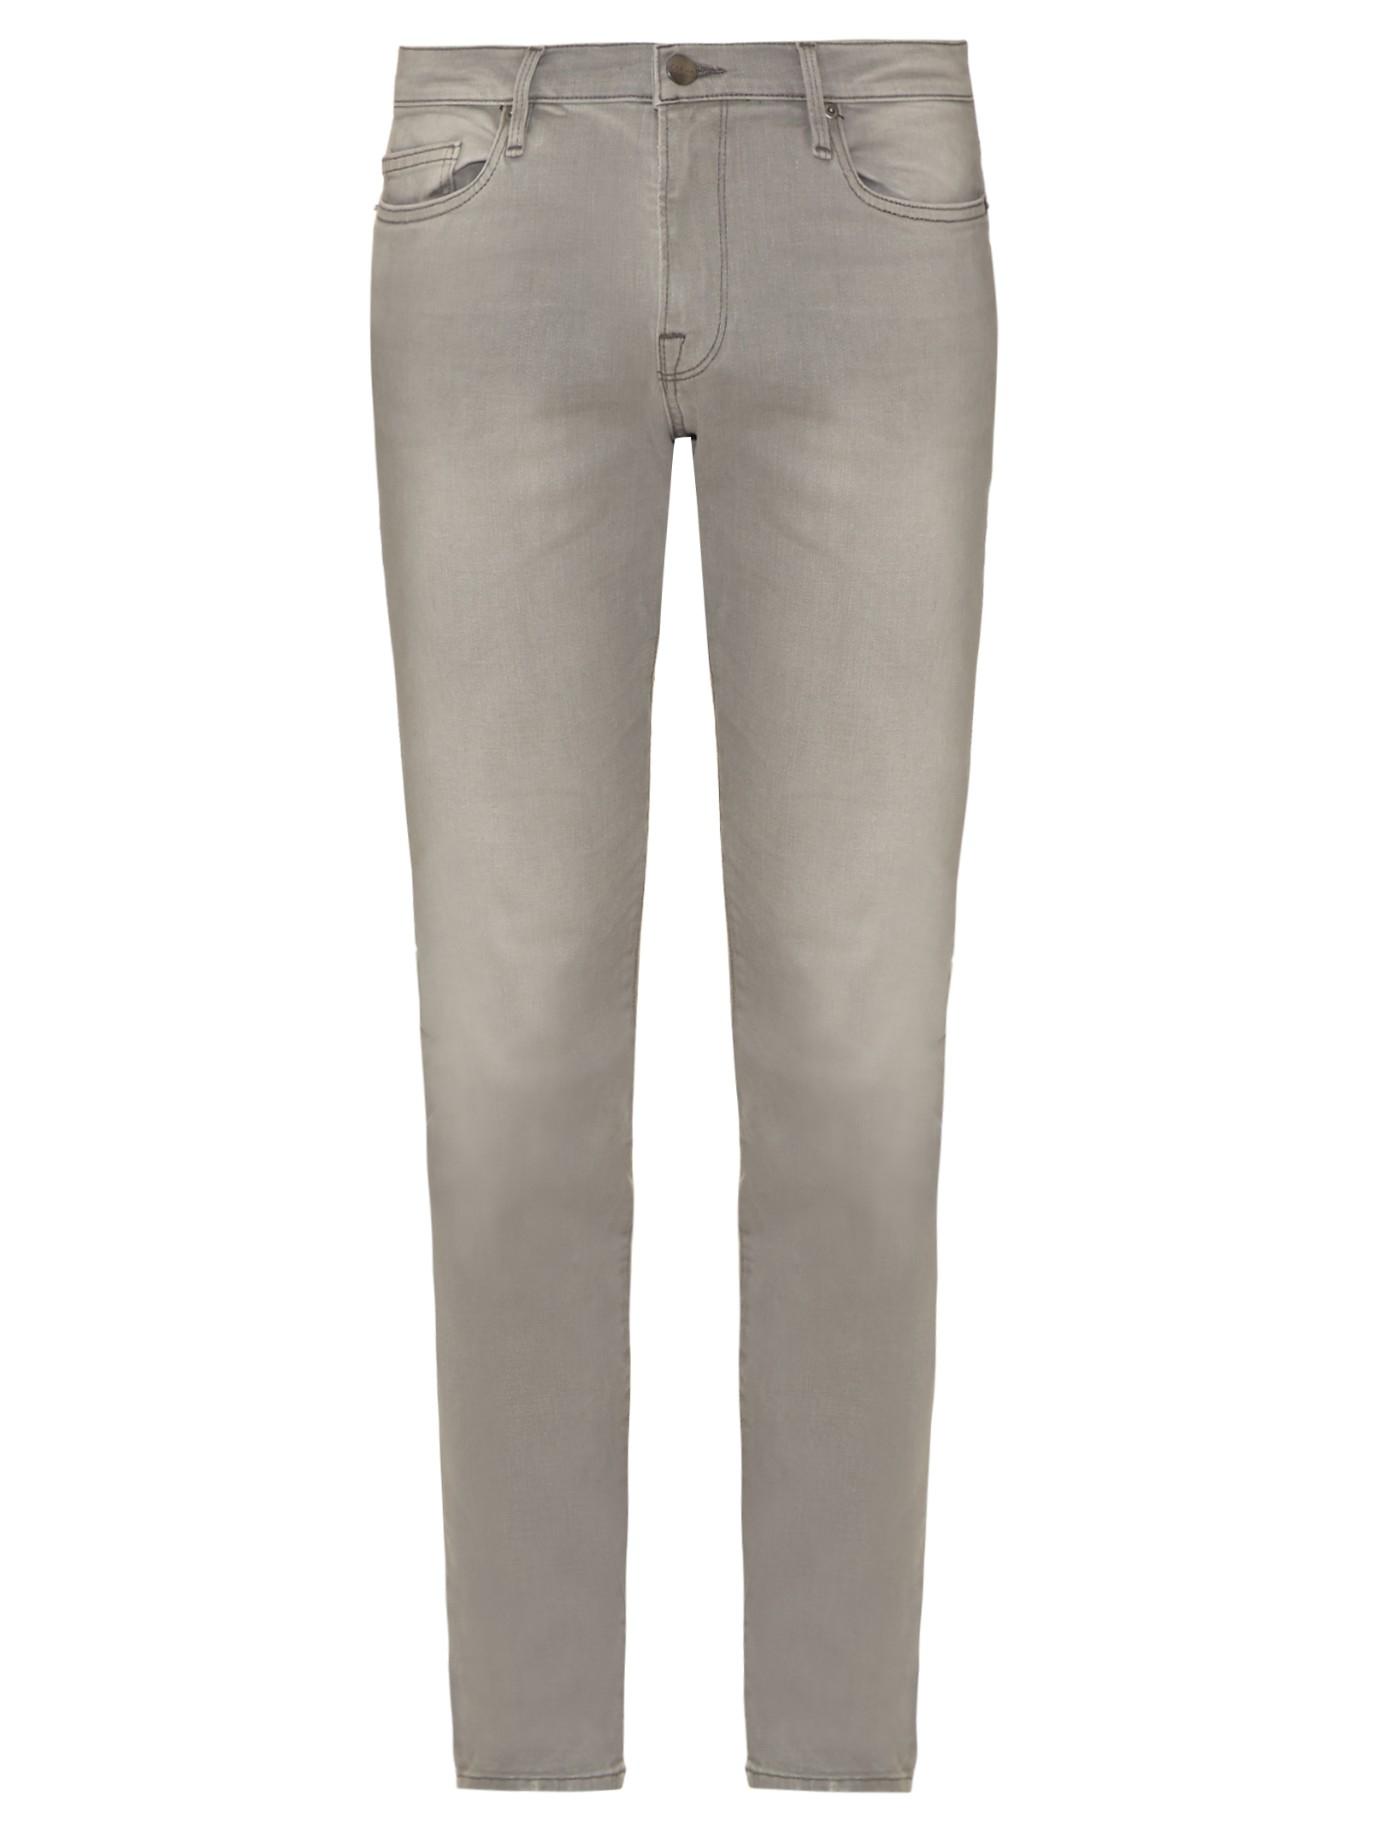 Lyst Frame L Homme Skinny Jeans In Gray For Men